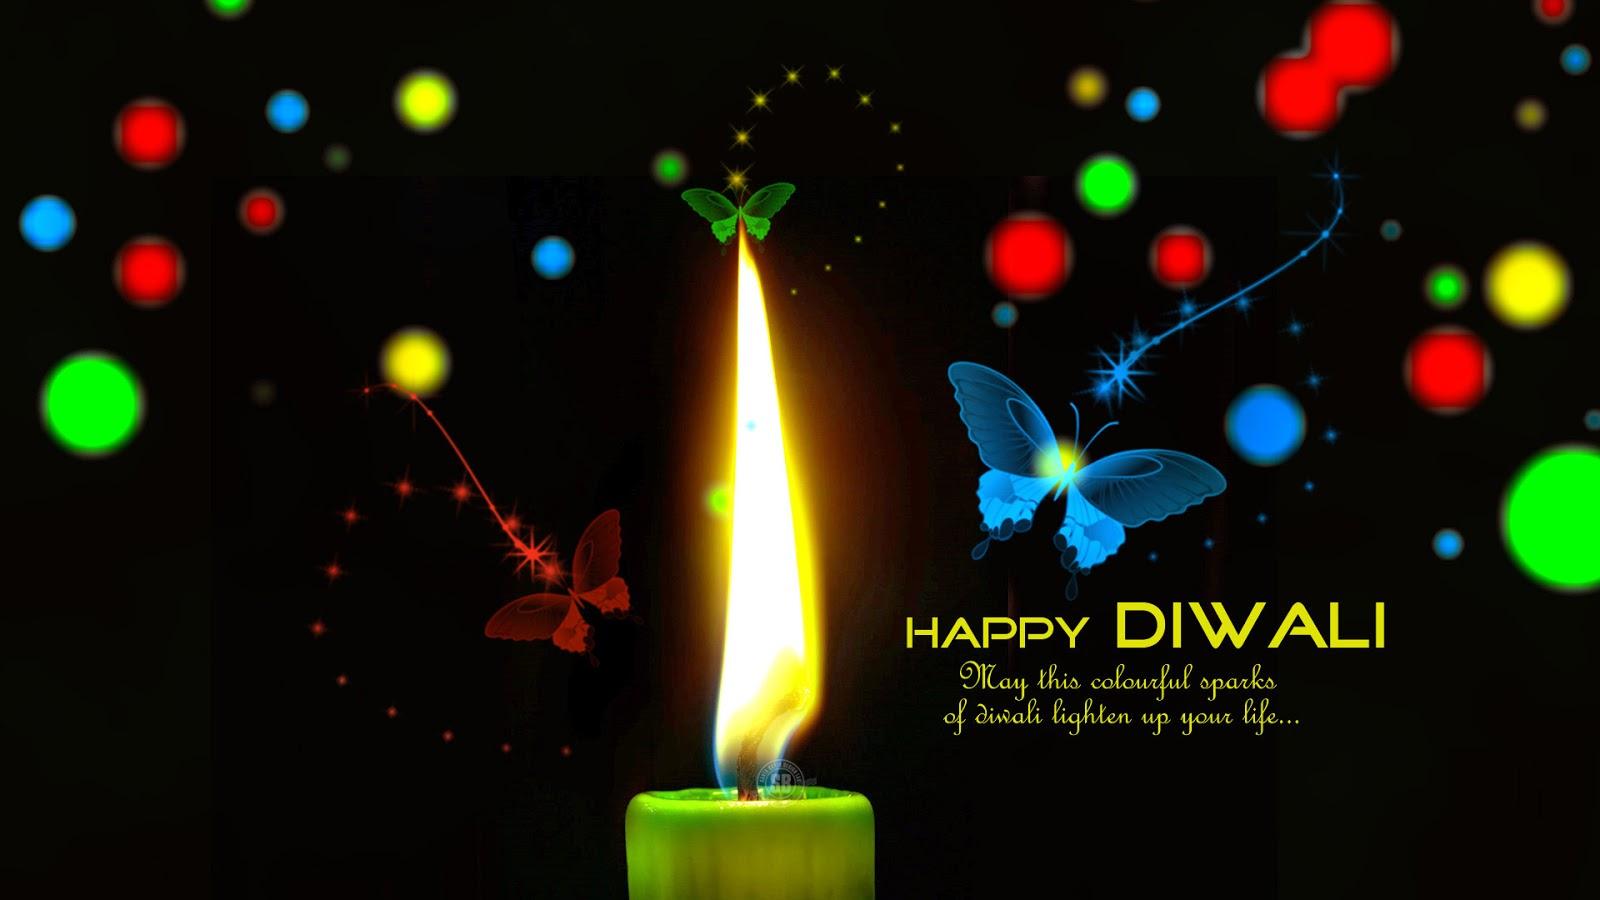 Whatsapp 3d Wallpaper Download Happy Diwali Hd Wallpapers 2018 Infotainment Jobs